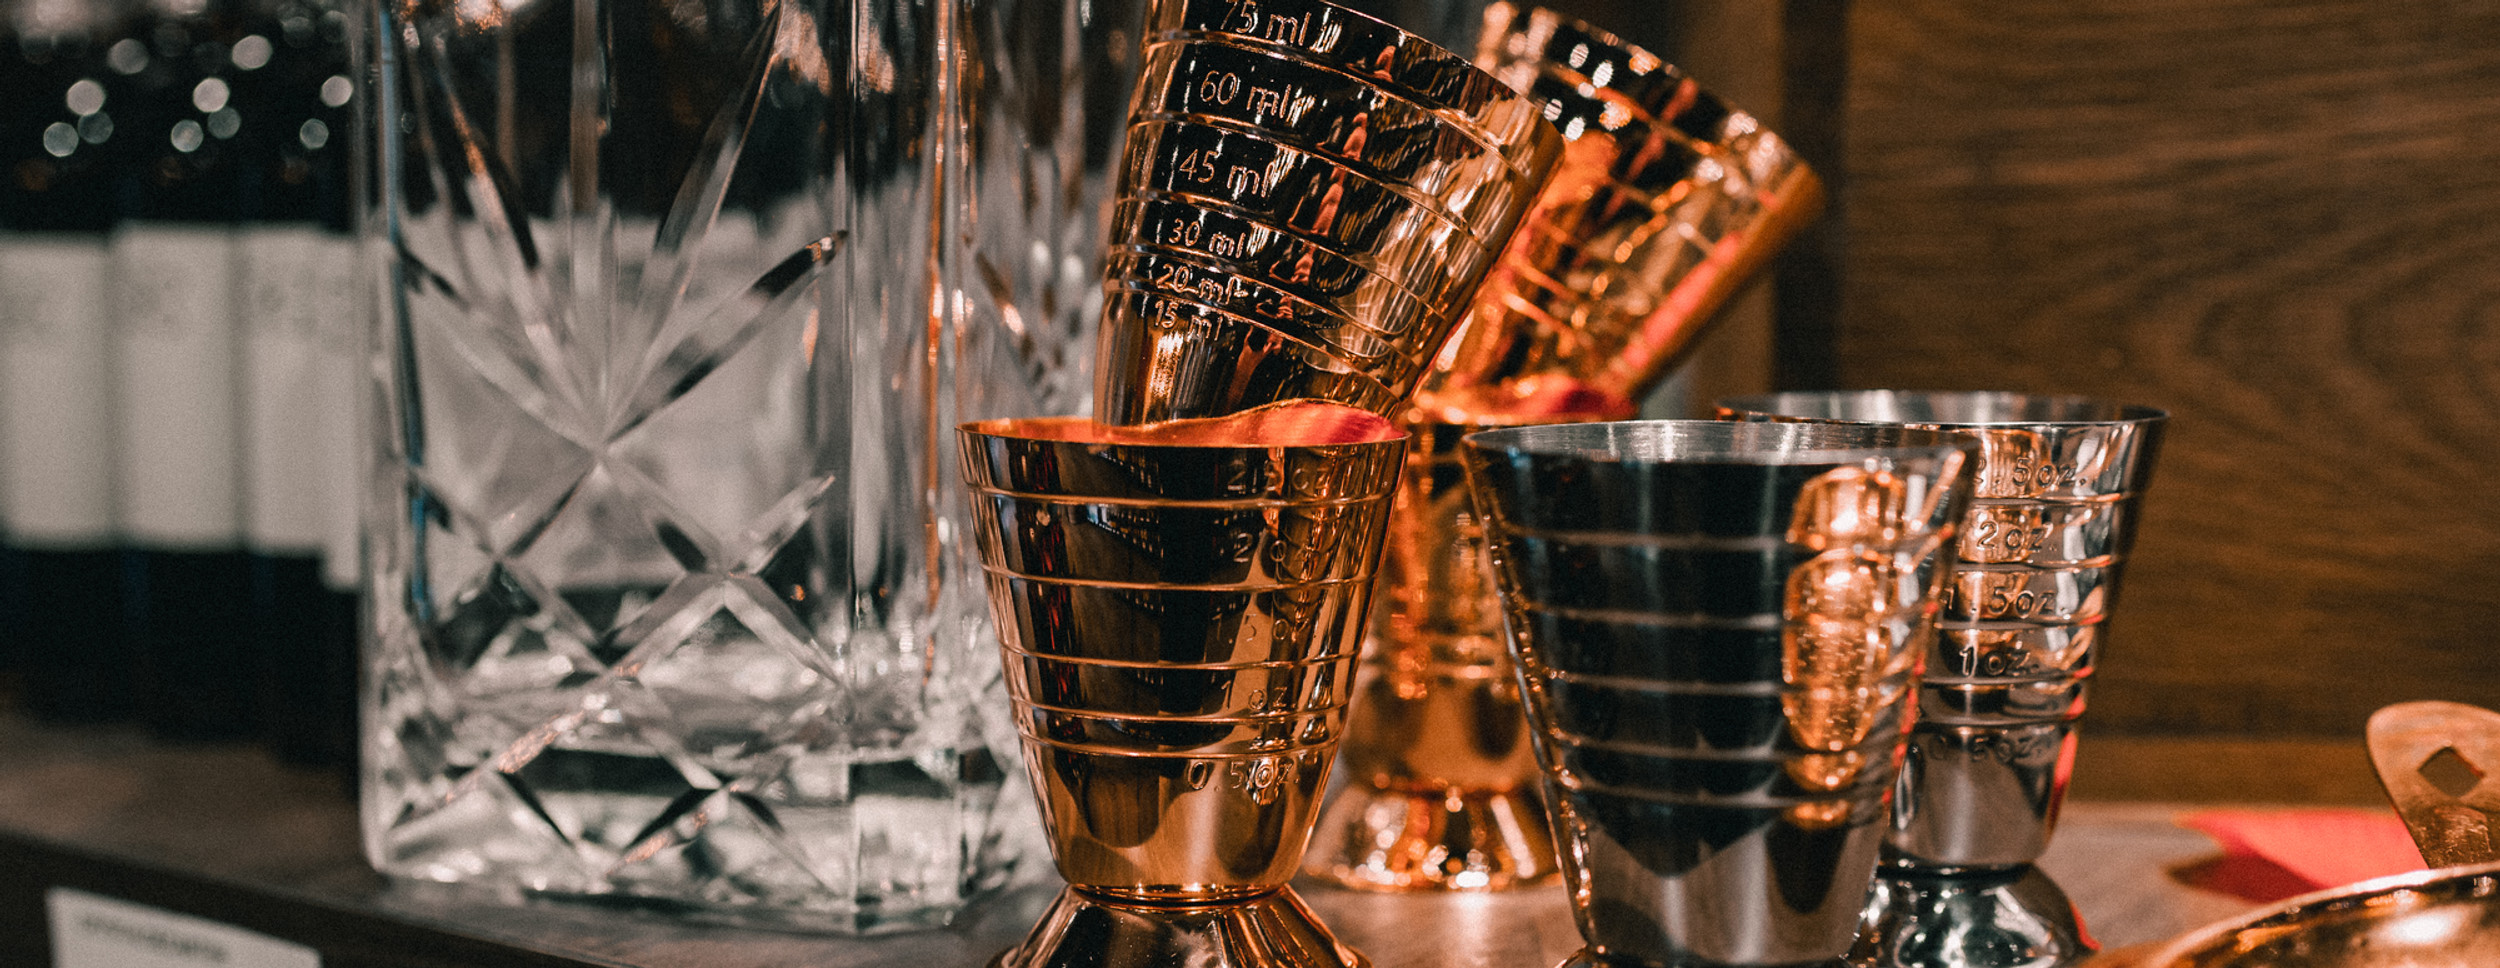 distilledliquor_websitephoto (10 of 27).